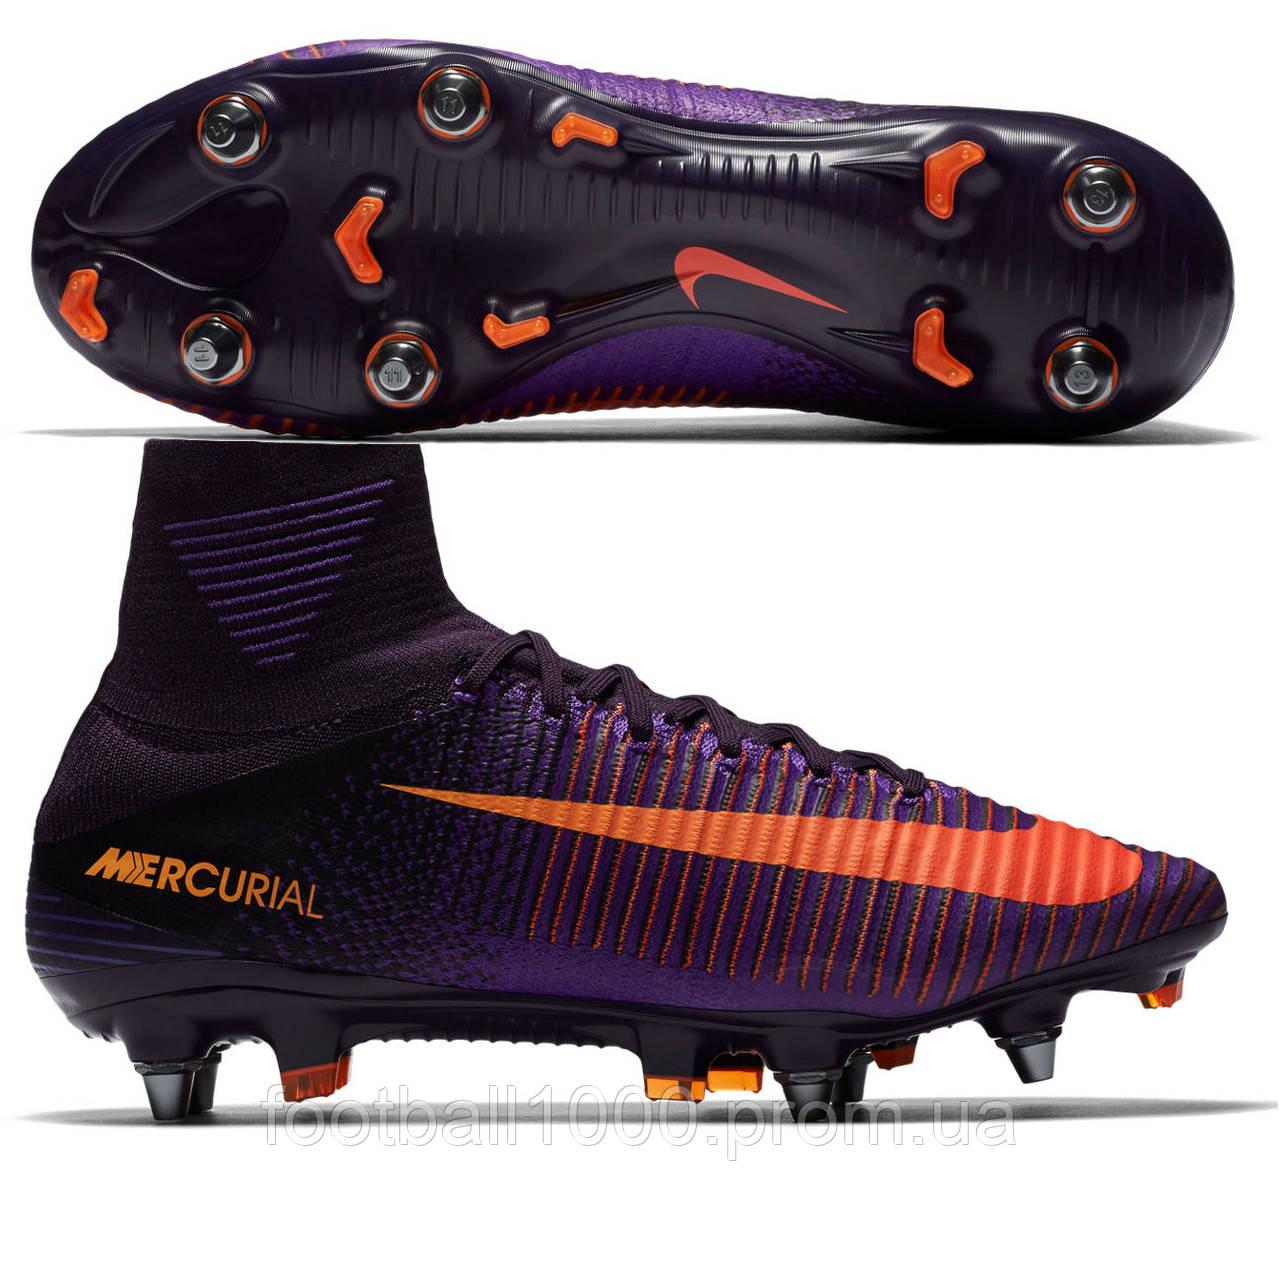 6cc9094c Бутсы футбольные Nike Mercurial Superfly V SG-PRO 831956-585 ...